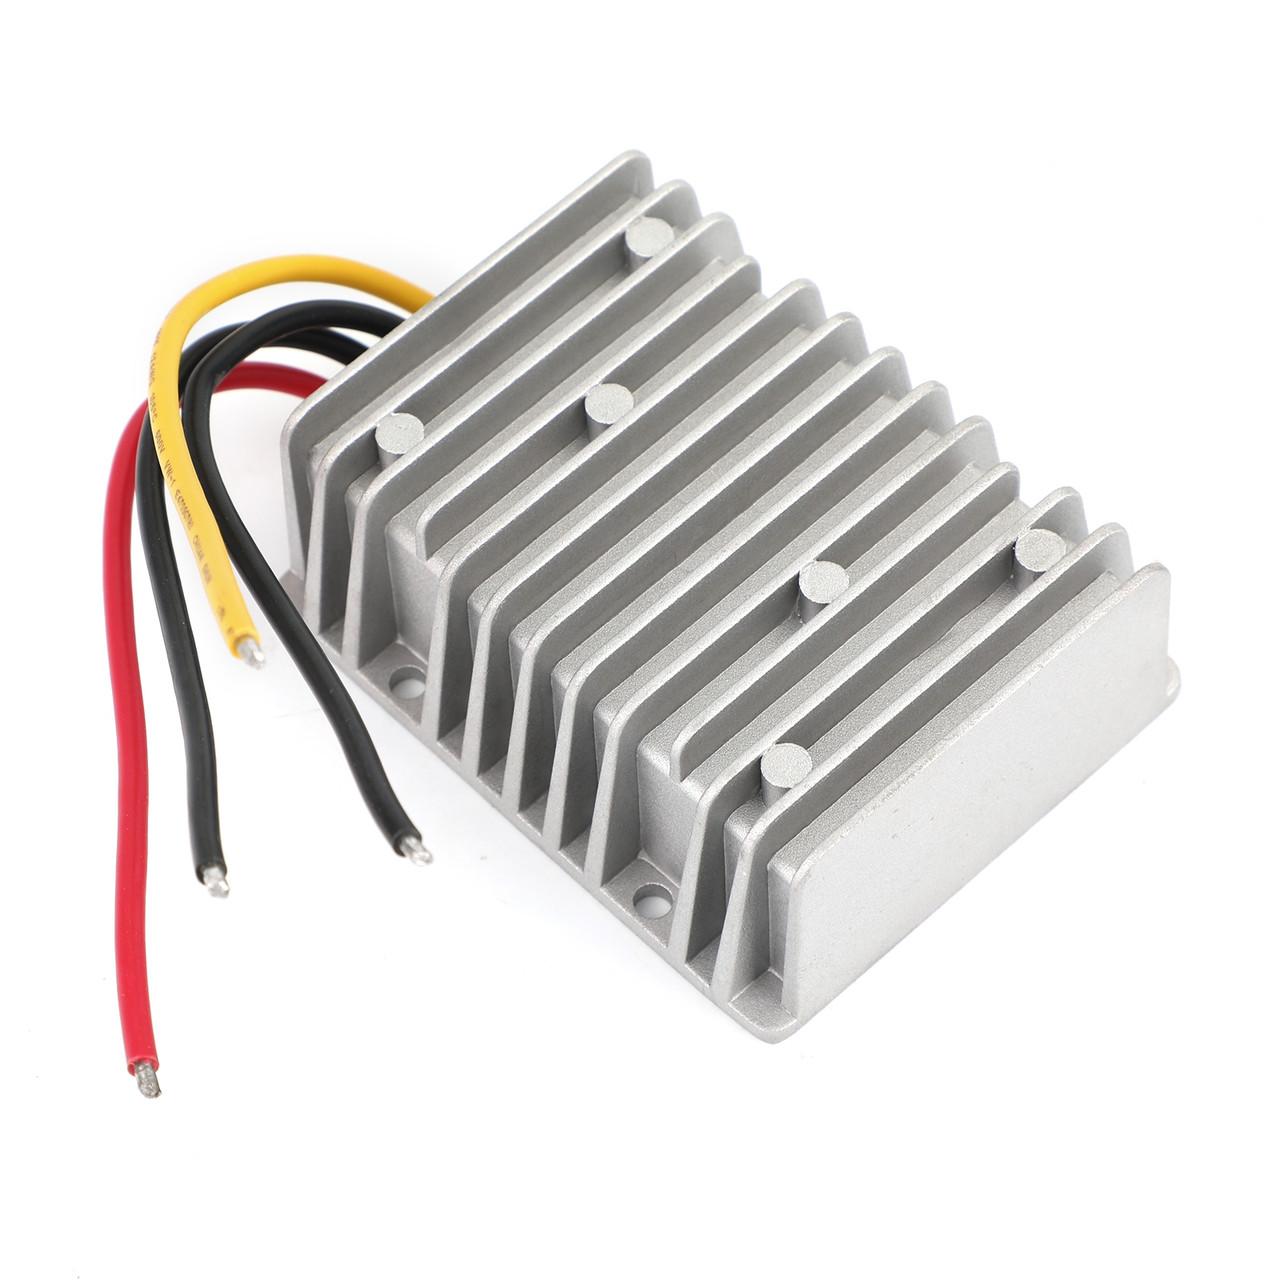 WaterProof 24V to 12V 40A 480W Step Down DC/DC Power Converter Regulator